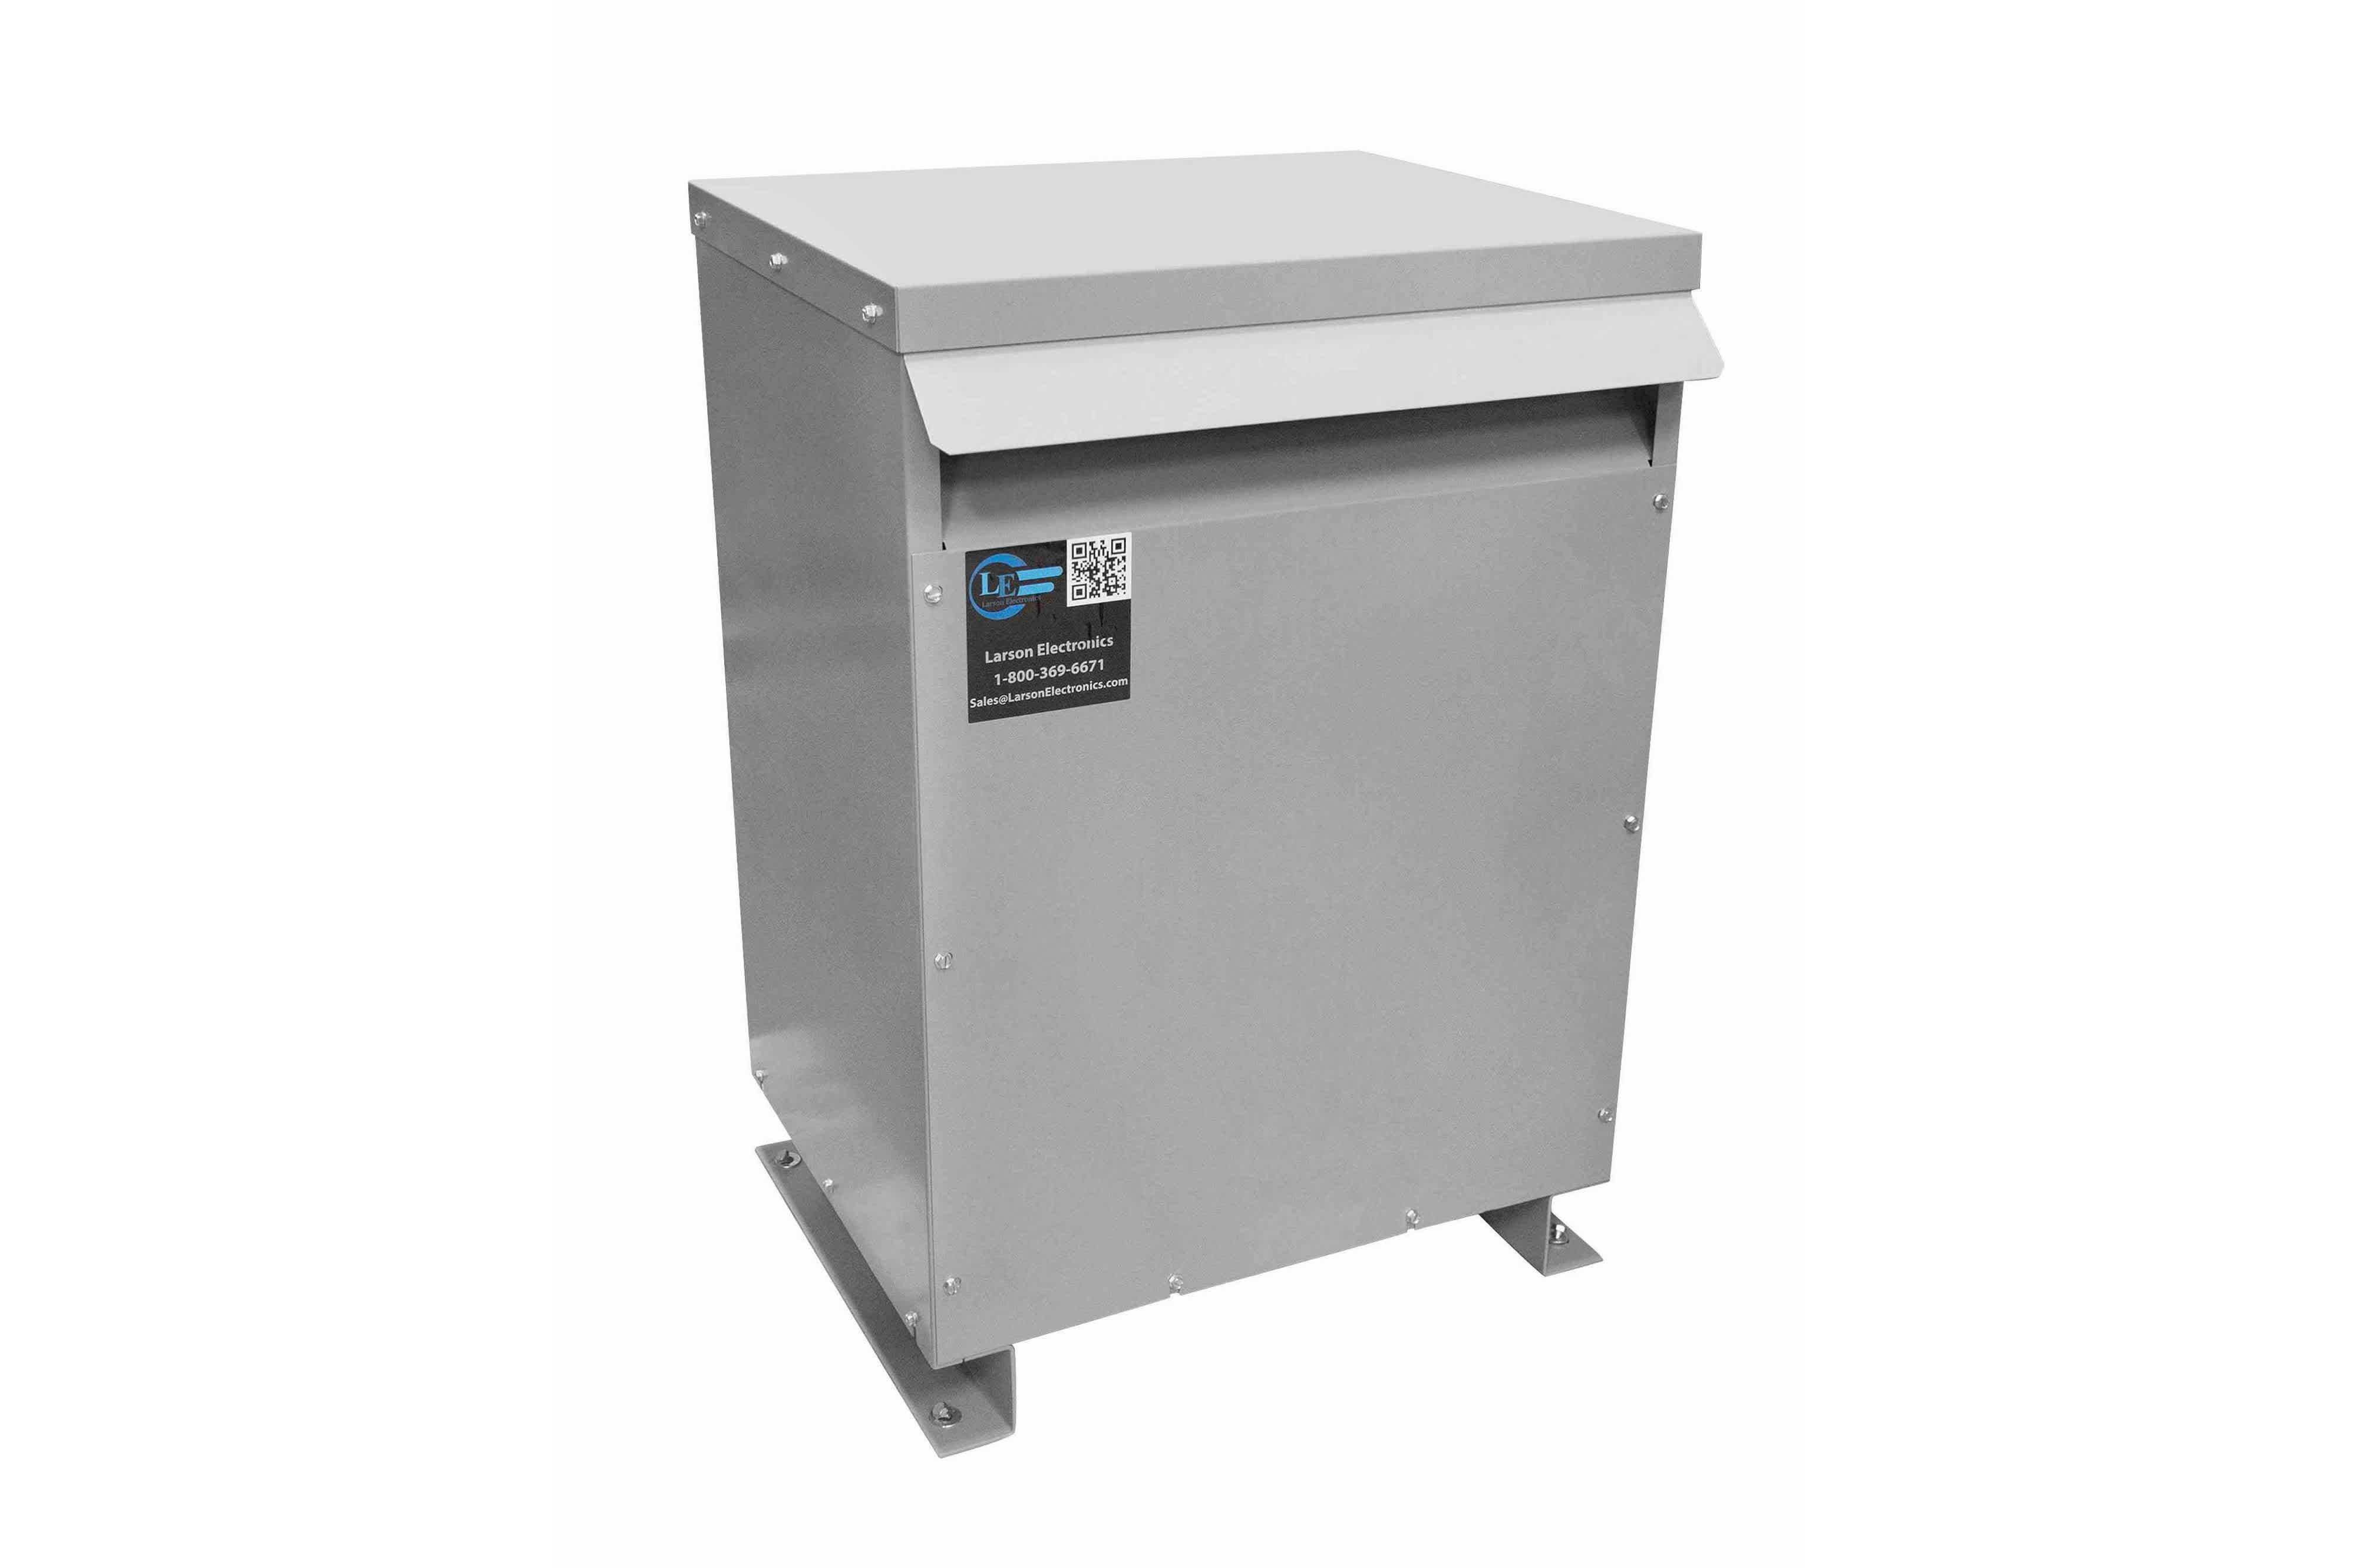 35 kVA 3PH Isolation Transformer, 600V Wye Primary, 240V Delta Secondary, N3R, Ventilated, 60 Hz